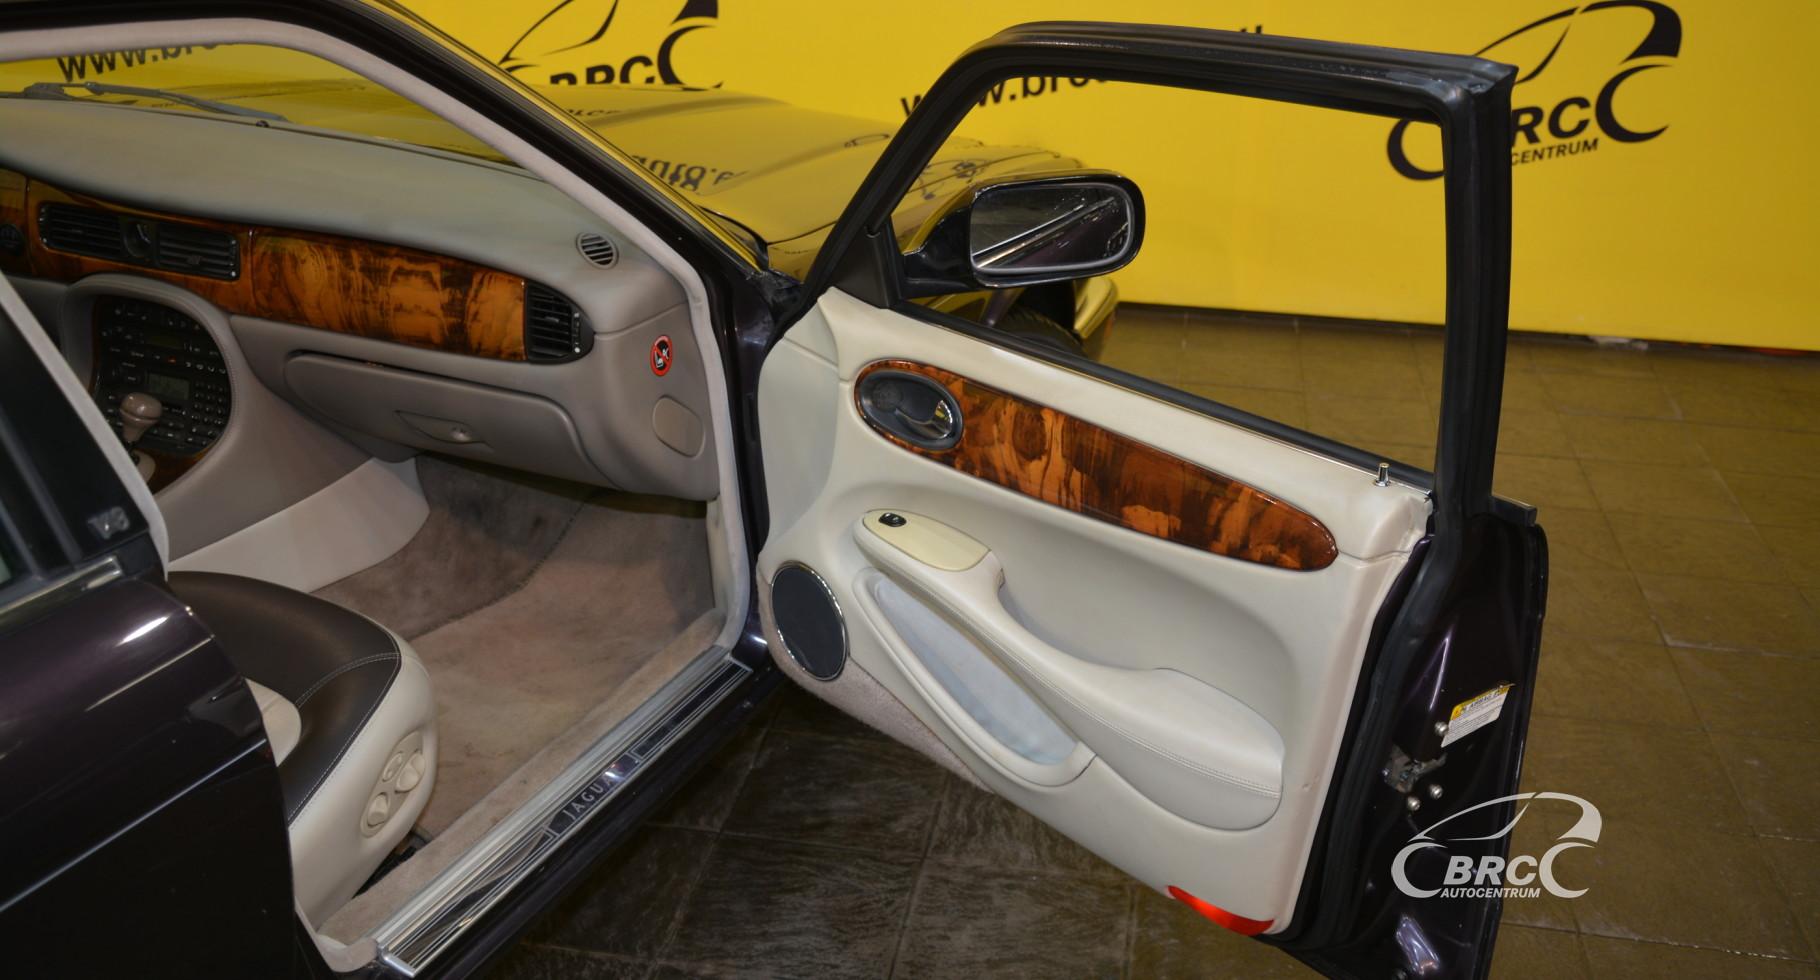 Jaguar XJ8 3.2 V8 Executive Automatas